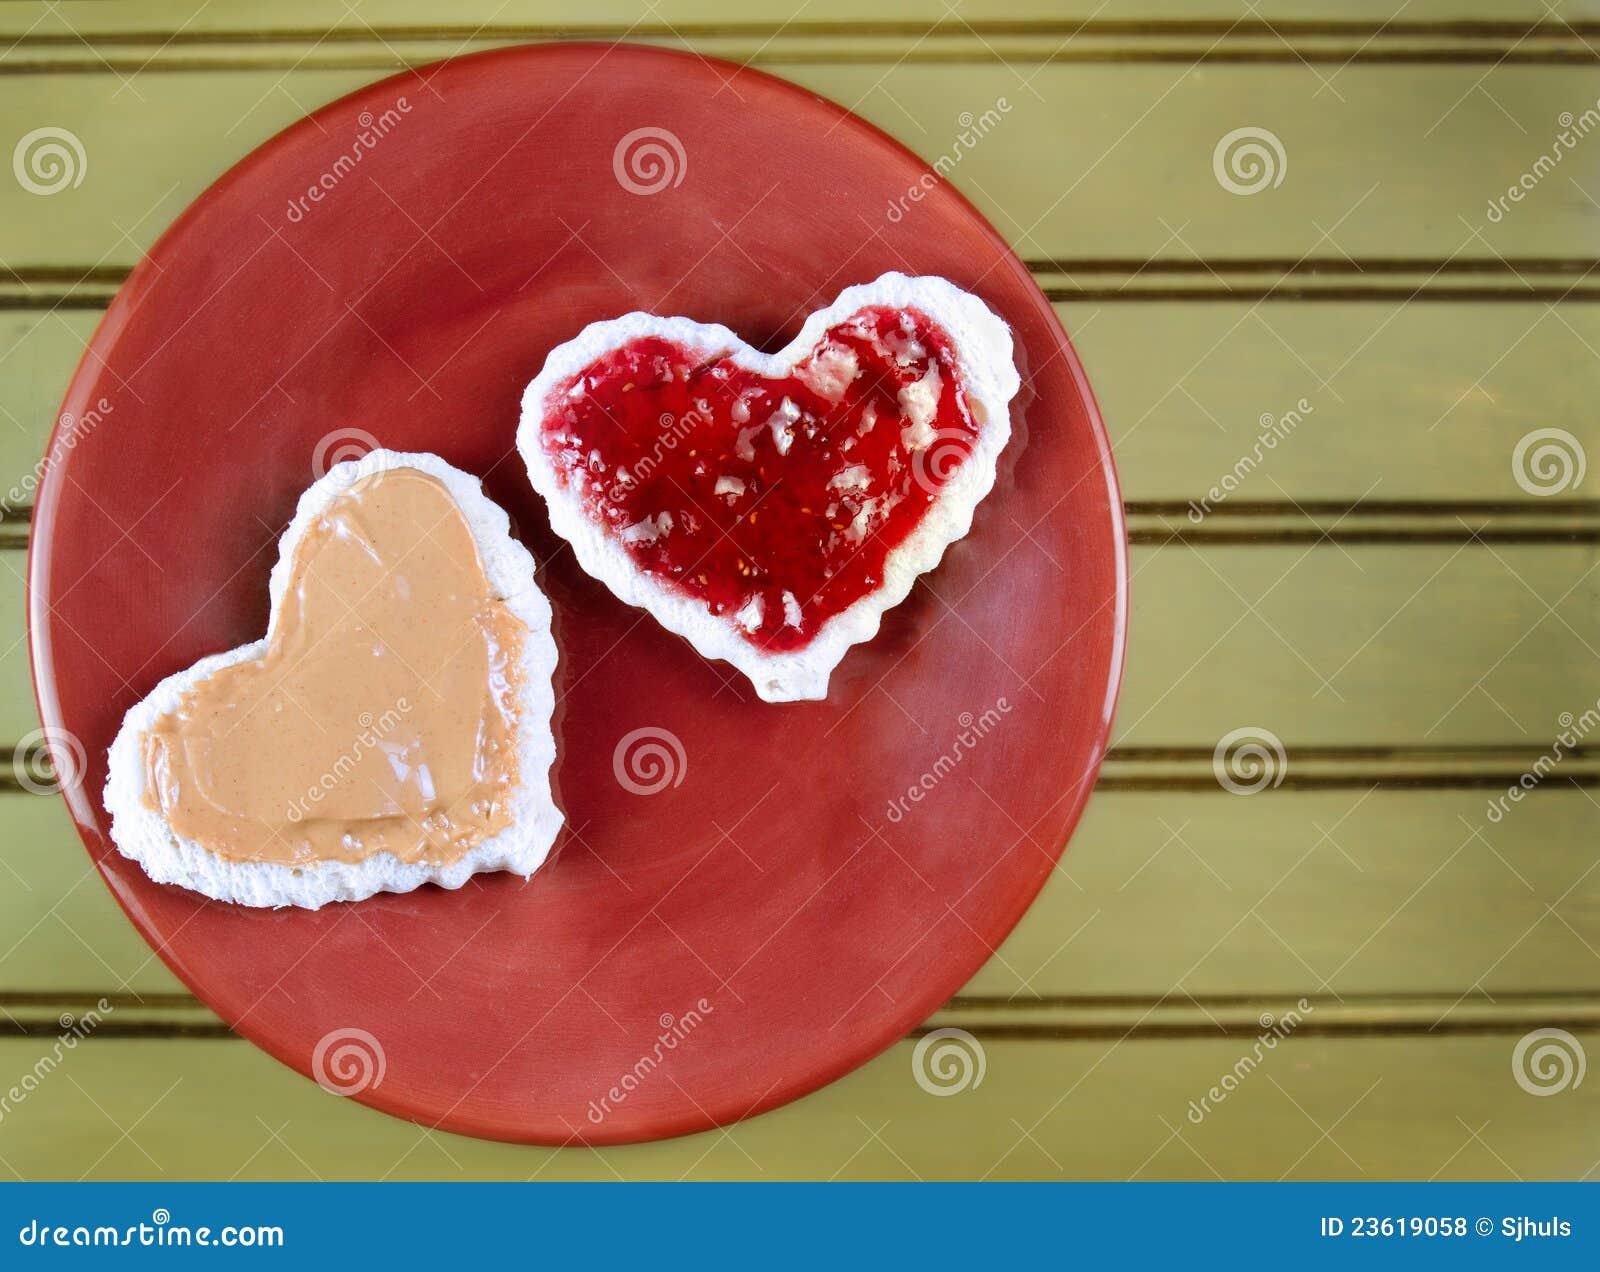 Peanut Butter And Jelly Heart heart shape peanut butter and jelly ...